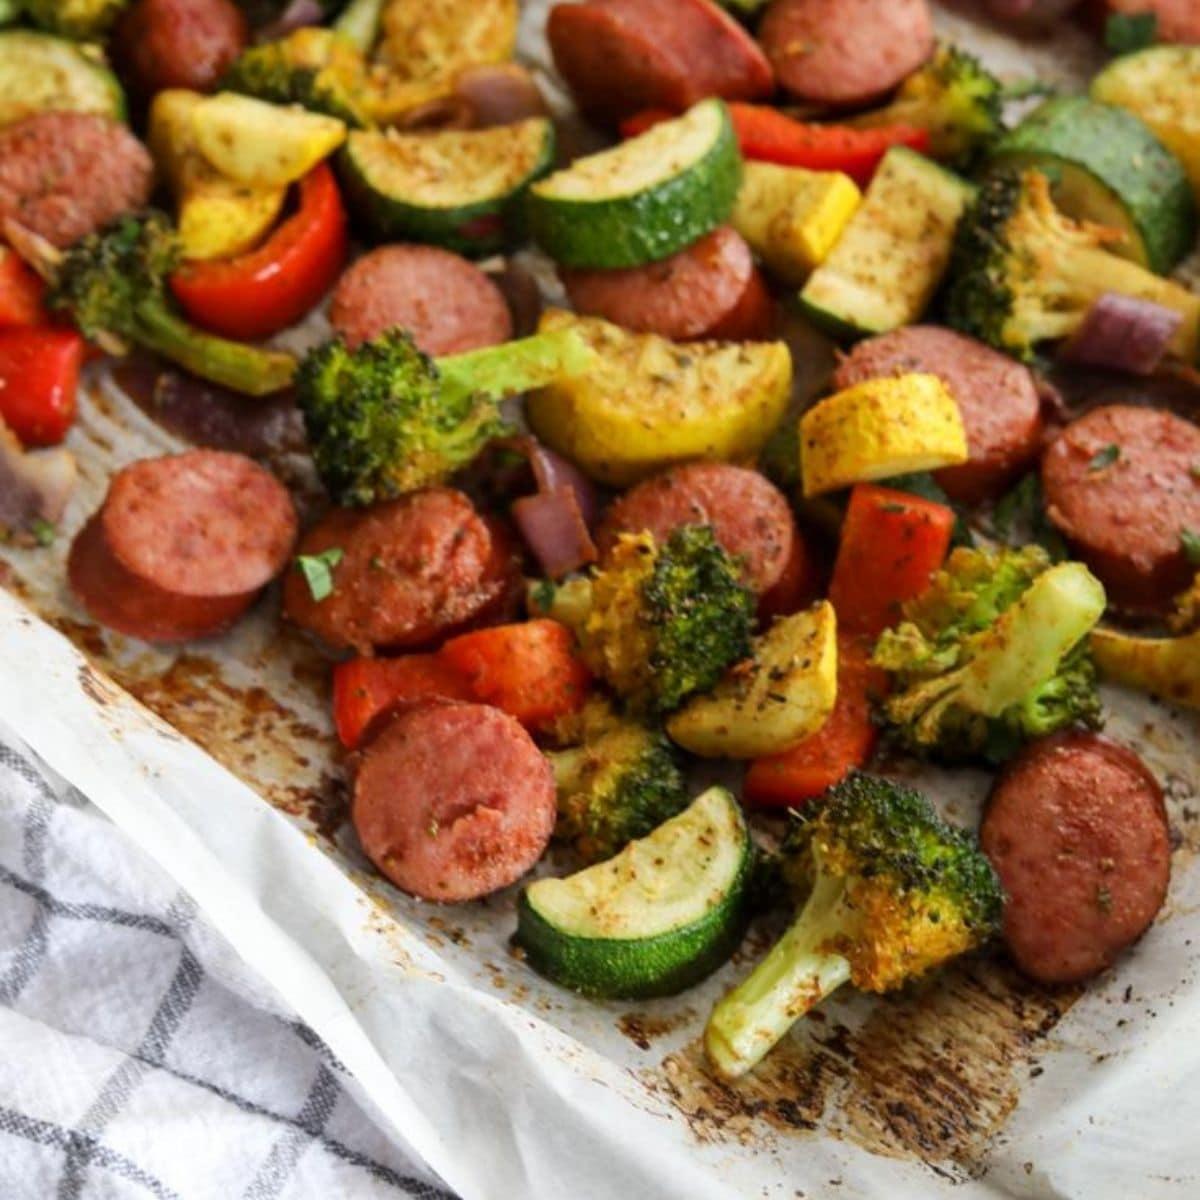 sausage on a keto diet